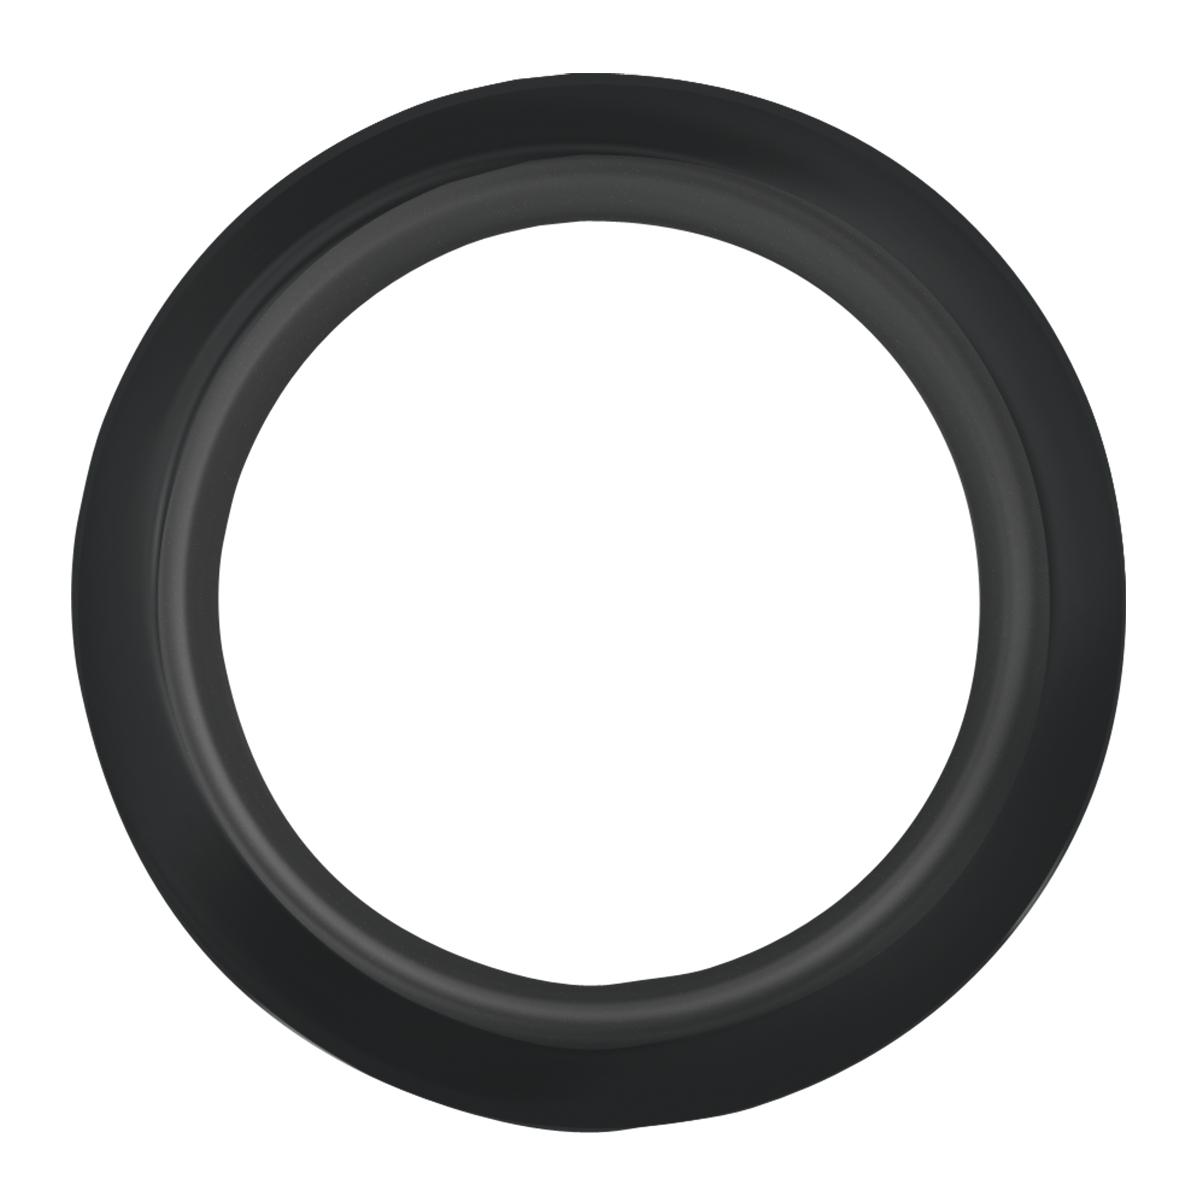 "80473 4"" Round Rubberized Vinyl Grommet"